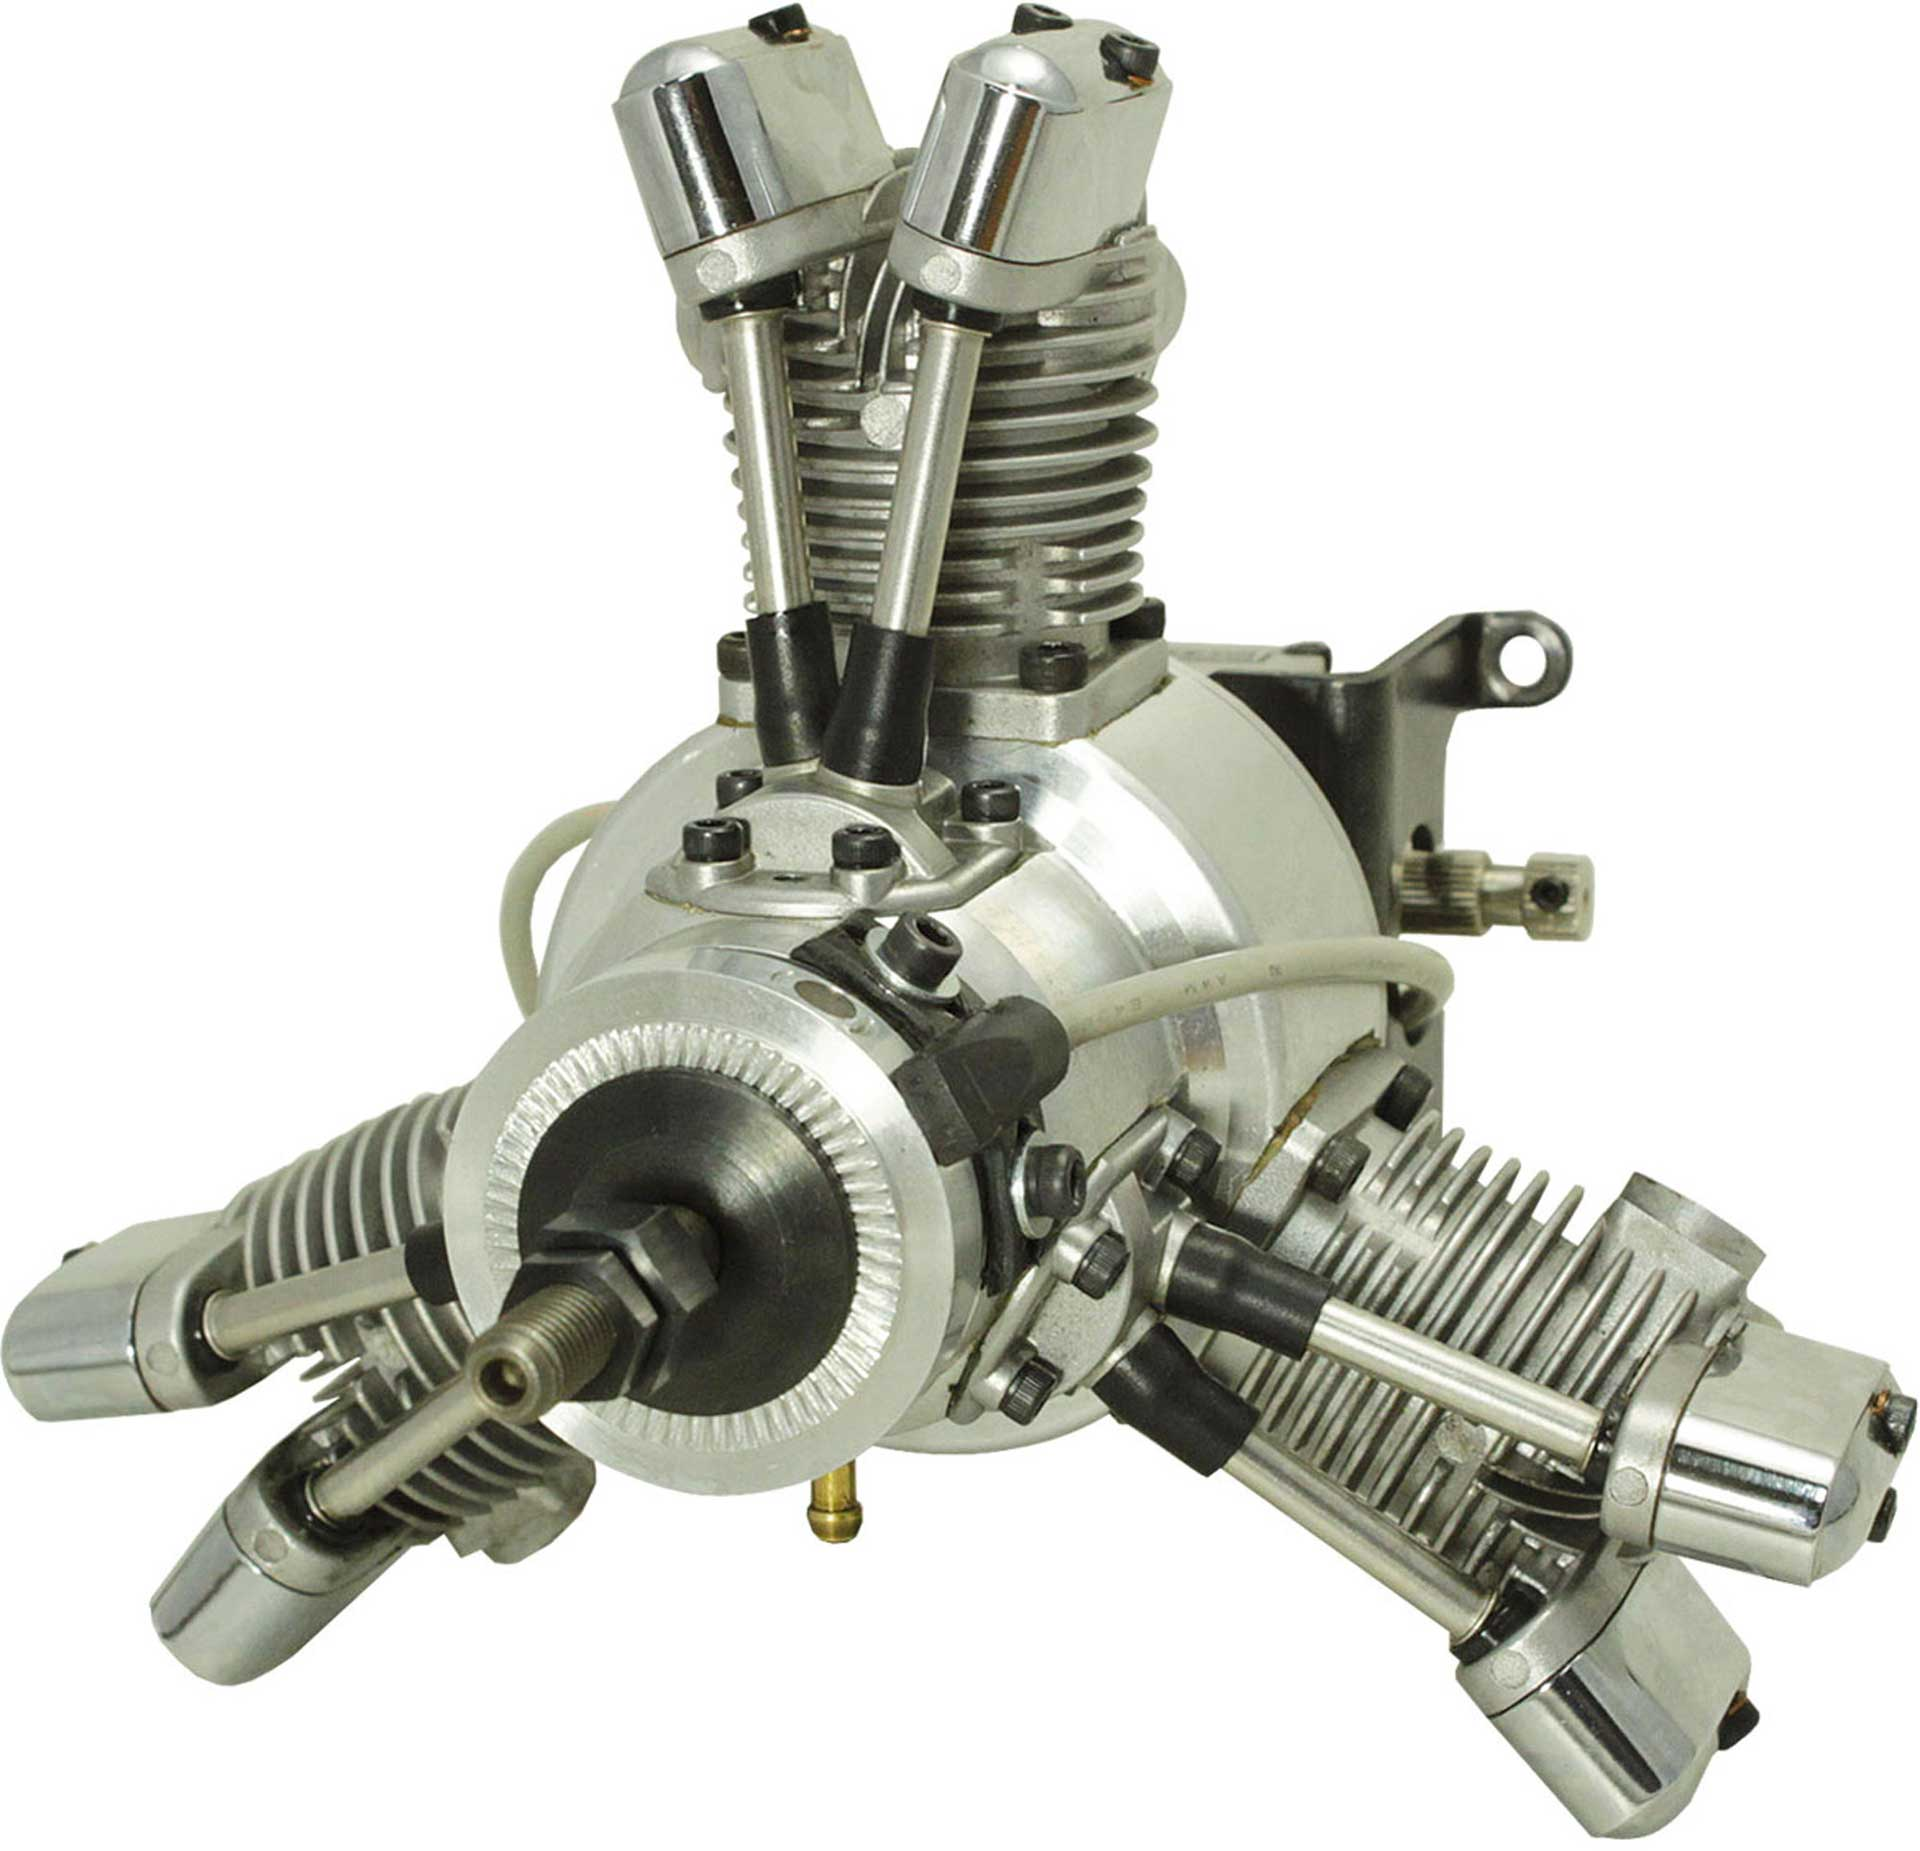 SAITO FG-19R3 PETROL ENGINE 3-CYLINDER RADIAL ENGINE WITH ELECTRONIC IGNITION